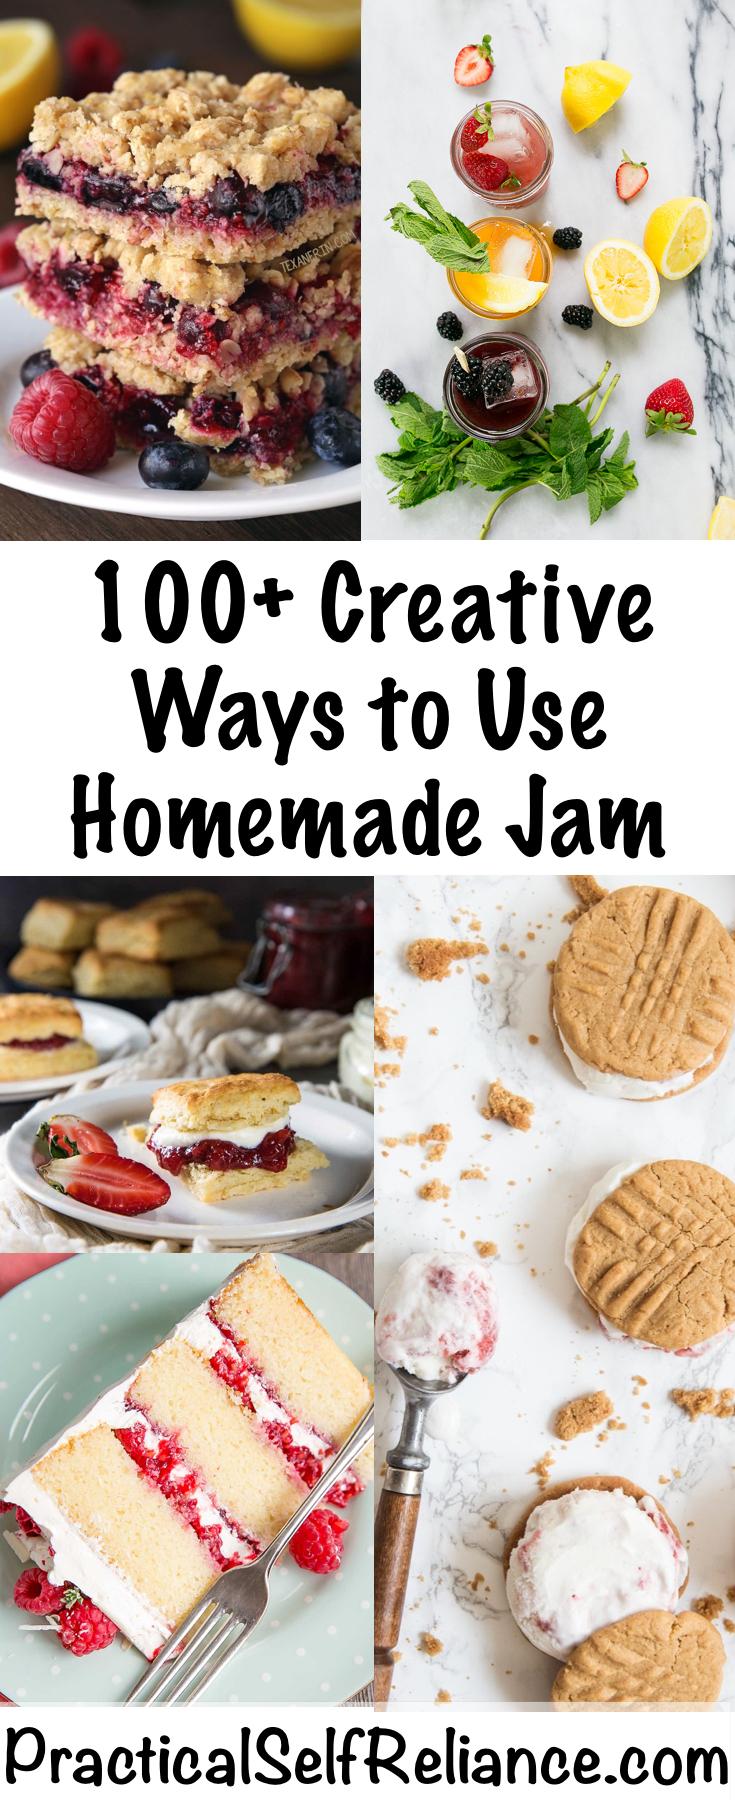 Creative Ways to Use Homemade Jam ~ Recipes Using Jam